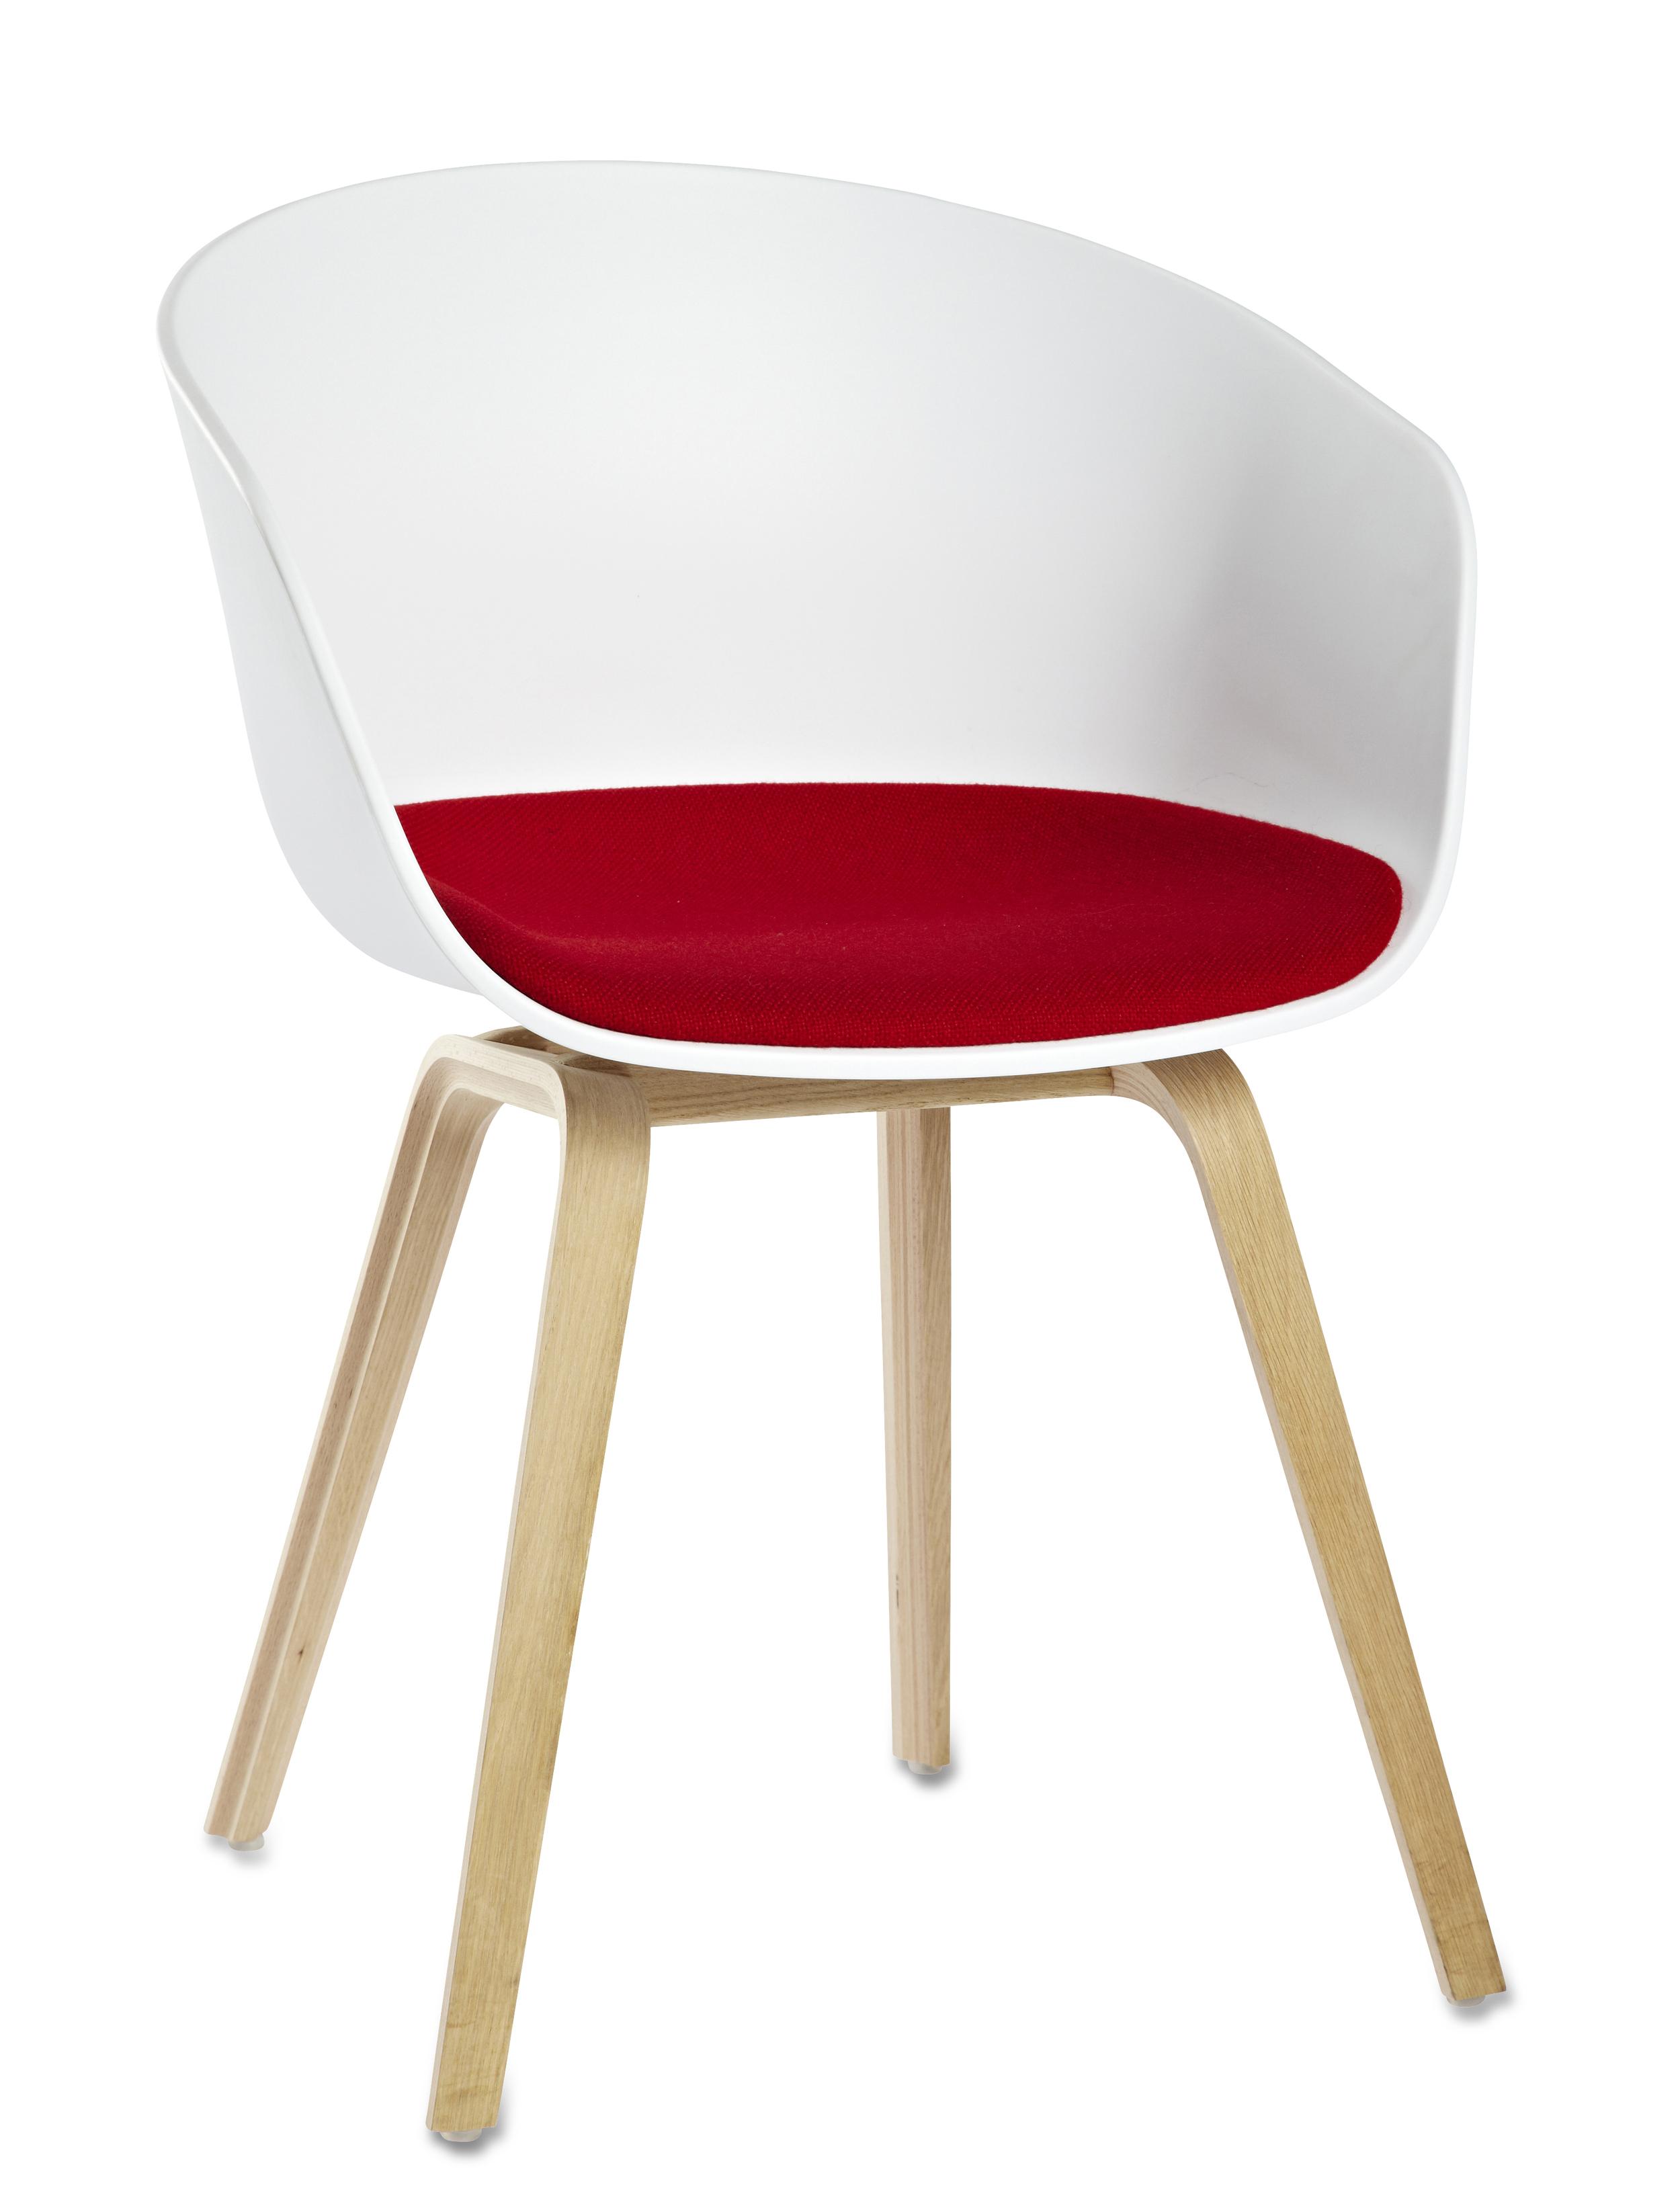 AAC23 Oak Soaped Base white w. seat cushion hallingdal 674 HAY About a chair design stoel Loncin design meubel zetel Leuven Brussels mechelen antwerpen vlaams-branbant Limburg Hasselt Tongeren Genk Sint-Truiden Zoutleeuw.jpg